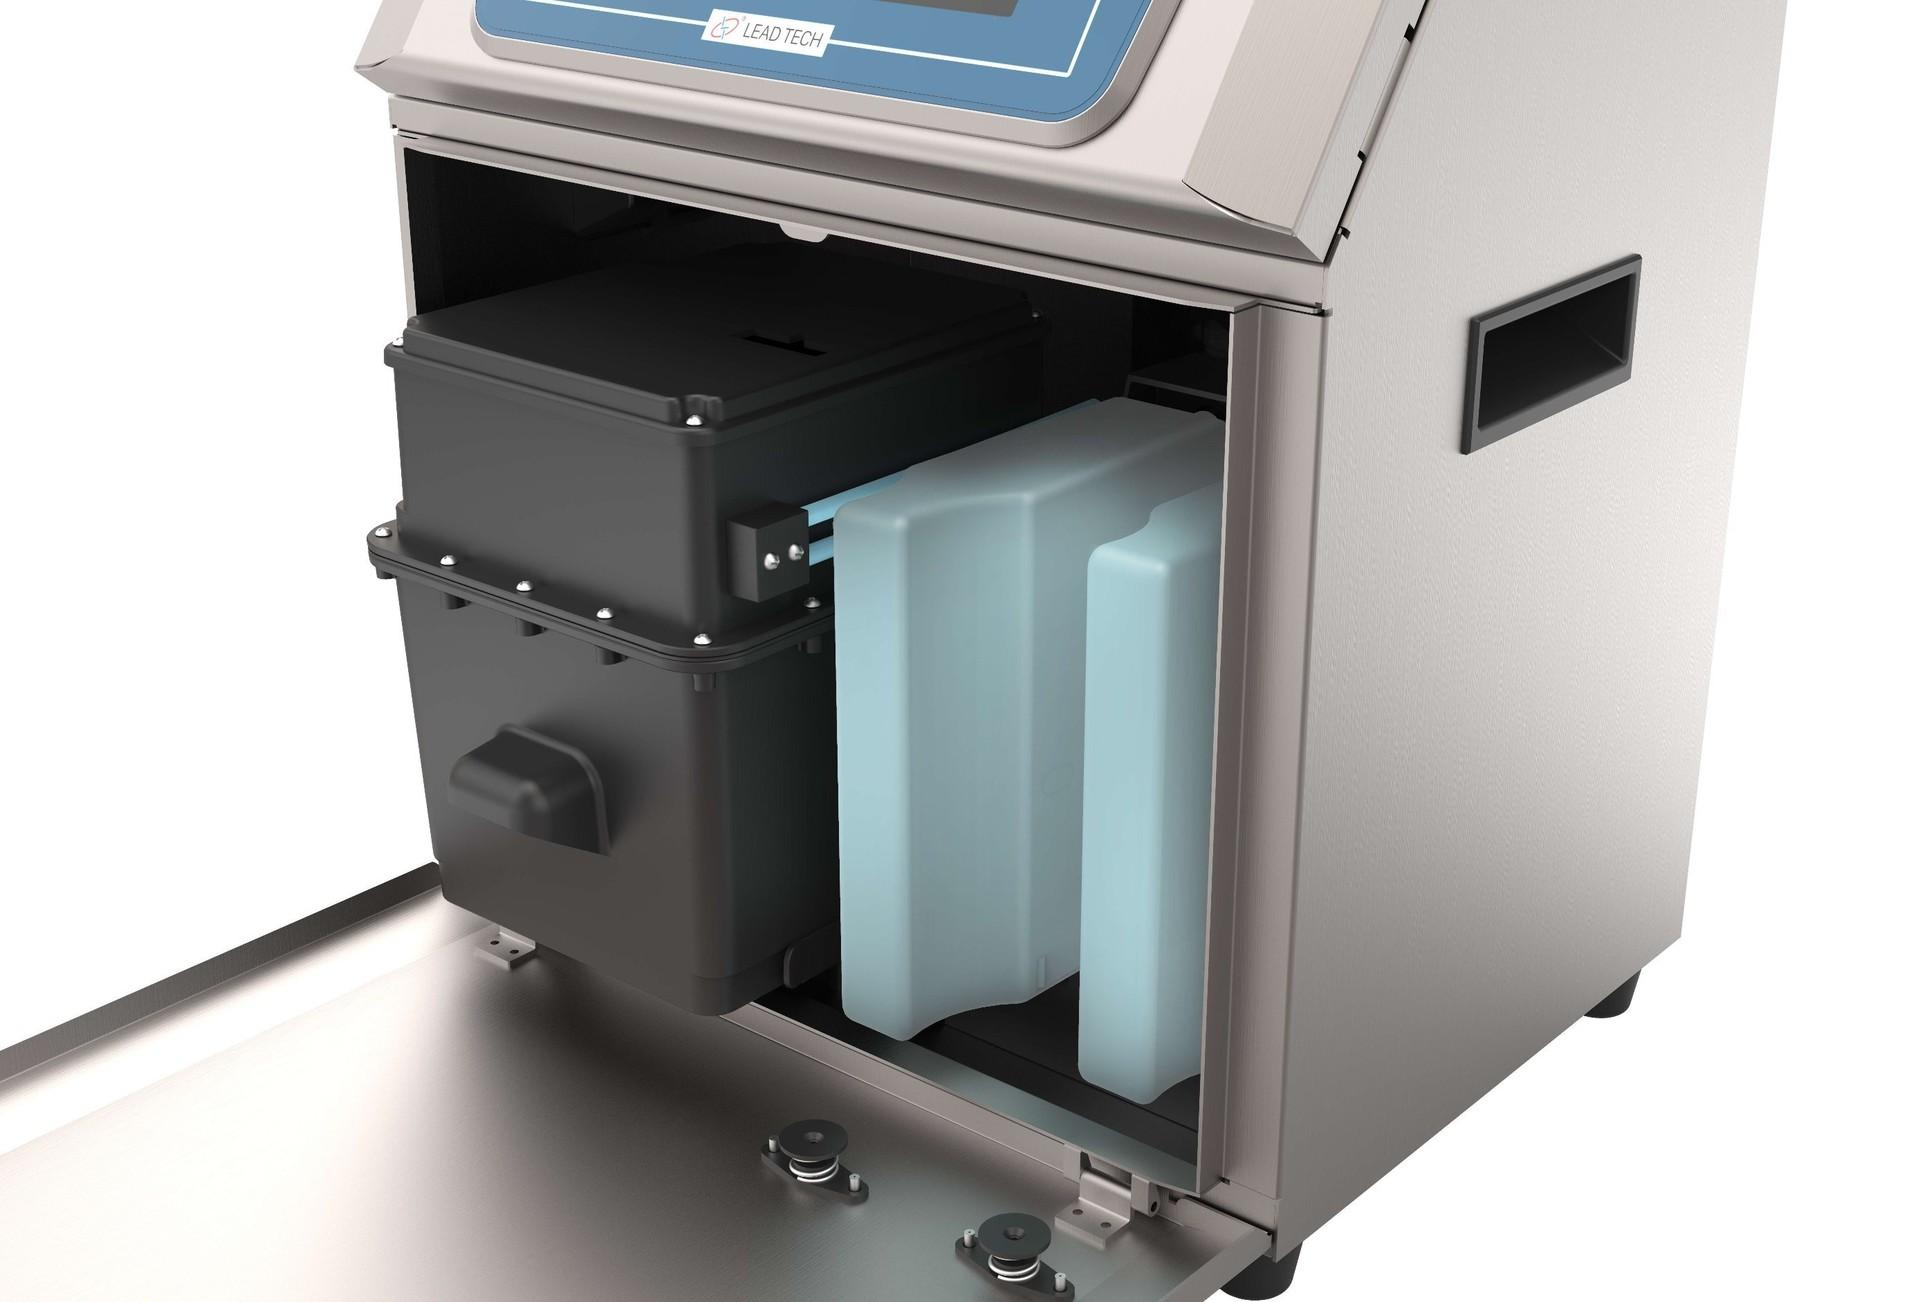 Lt800 Egg Coding Continuous Inkjet Printer